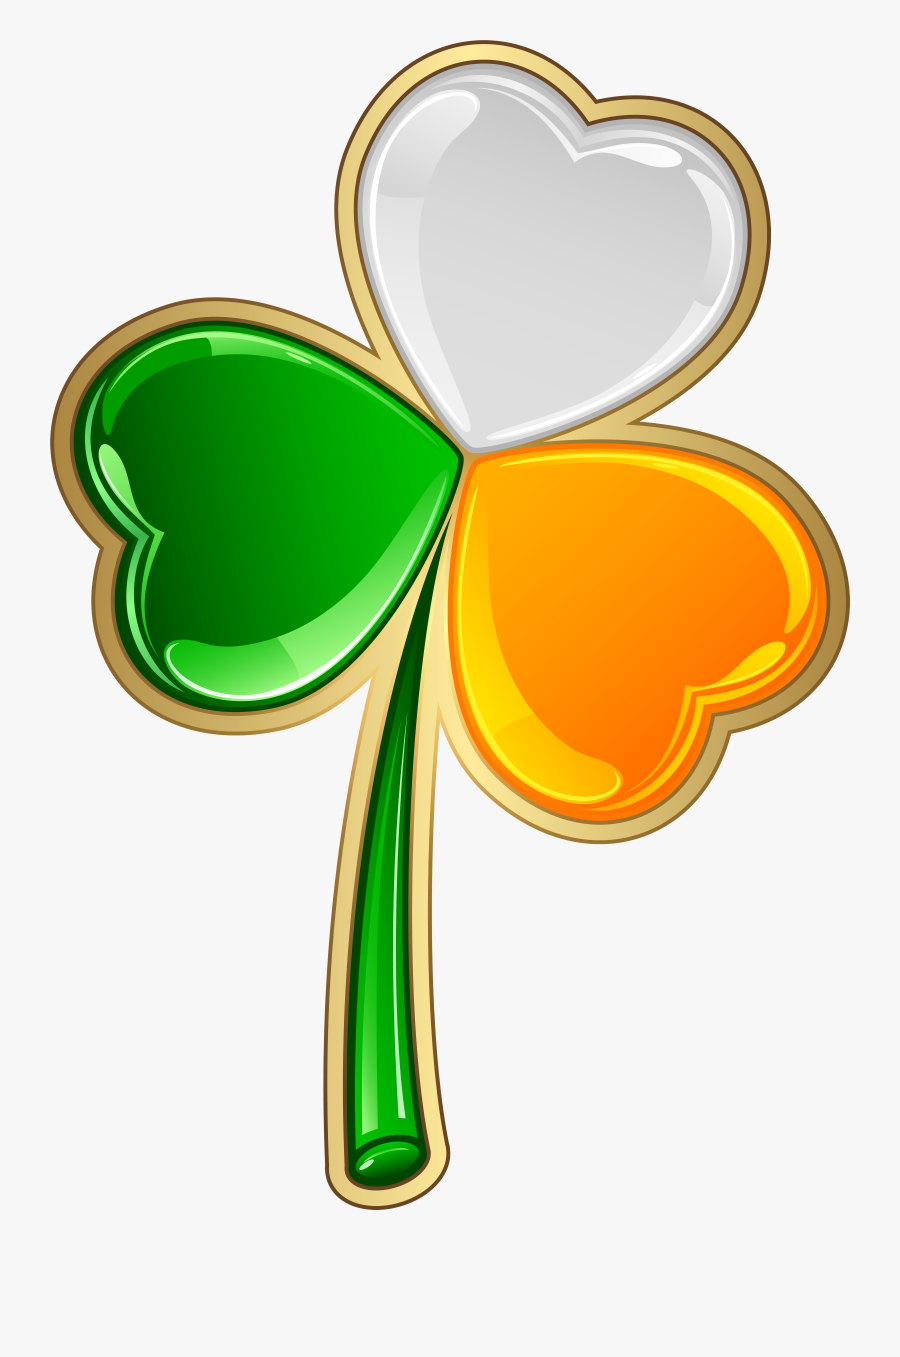 Shamrock Clipart Orange - Irish Shamrock Transparent Background, Transparent Clipart